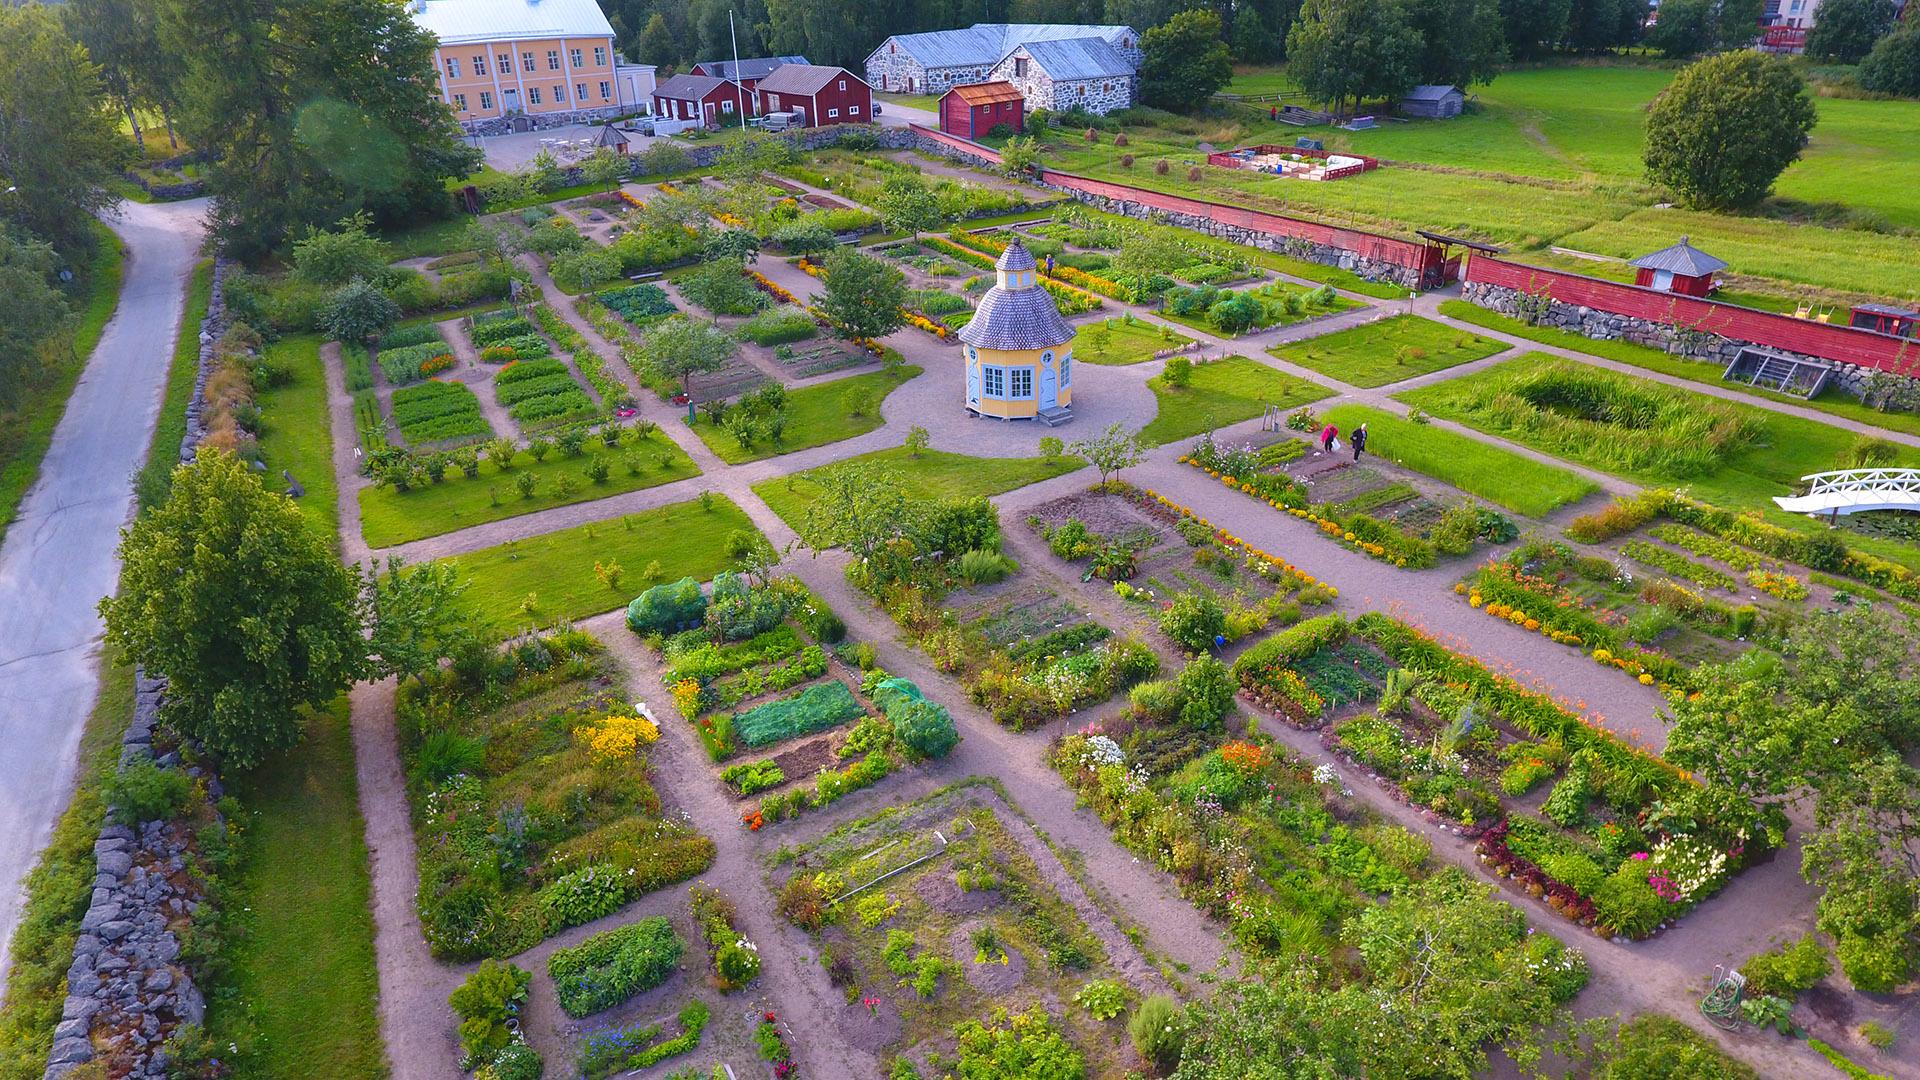 Pietarsaari_5_Rosenlund-garden_Image-source_-Visit-Pietarsaari